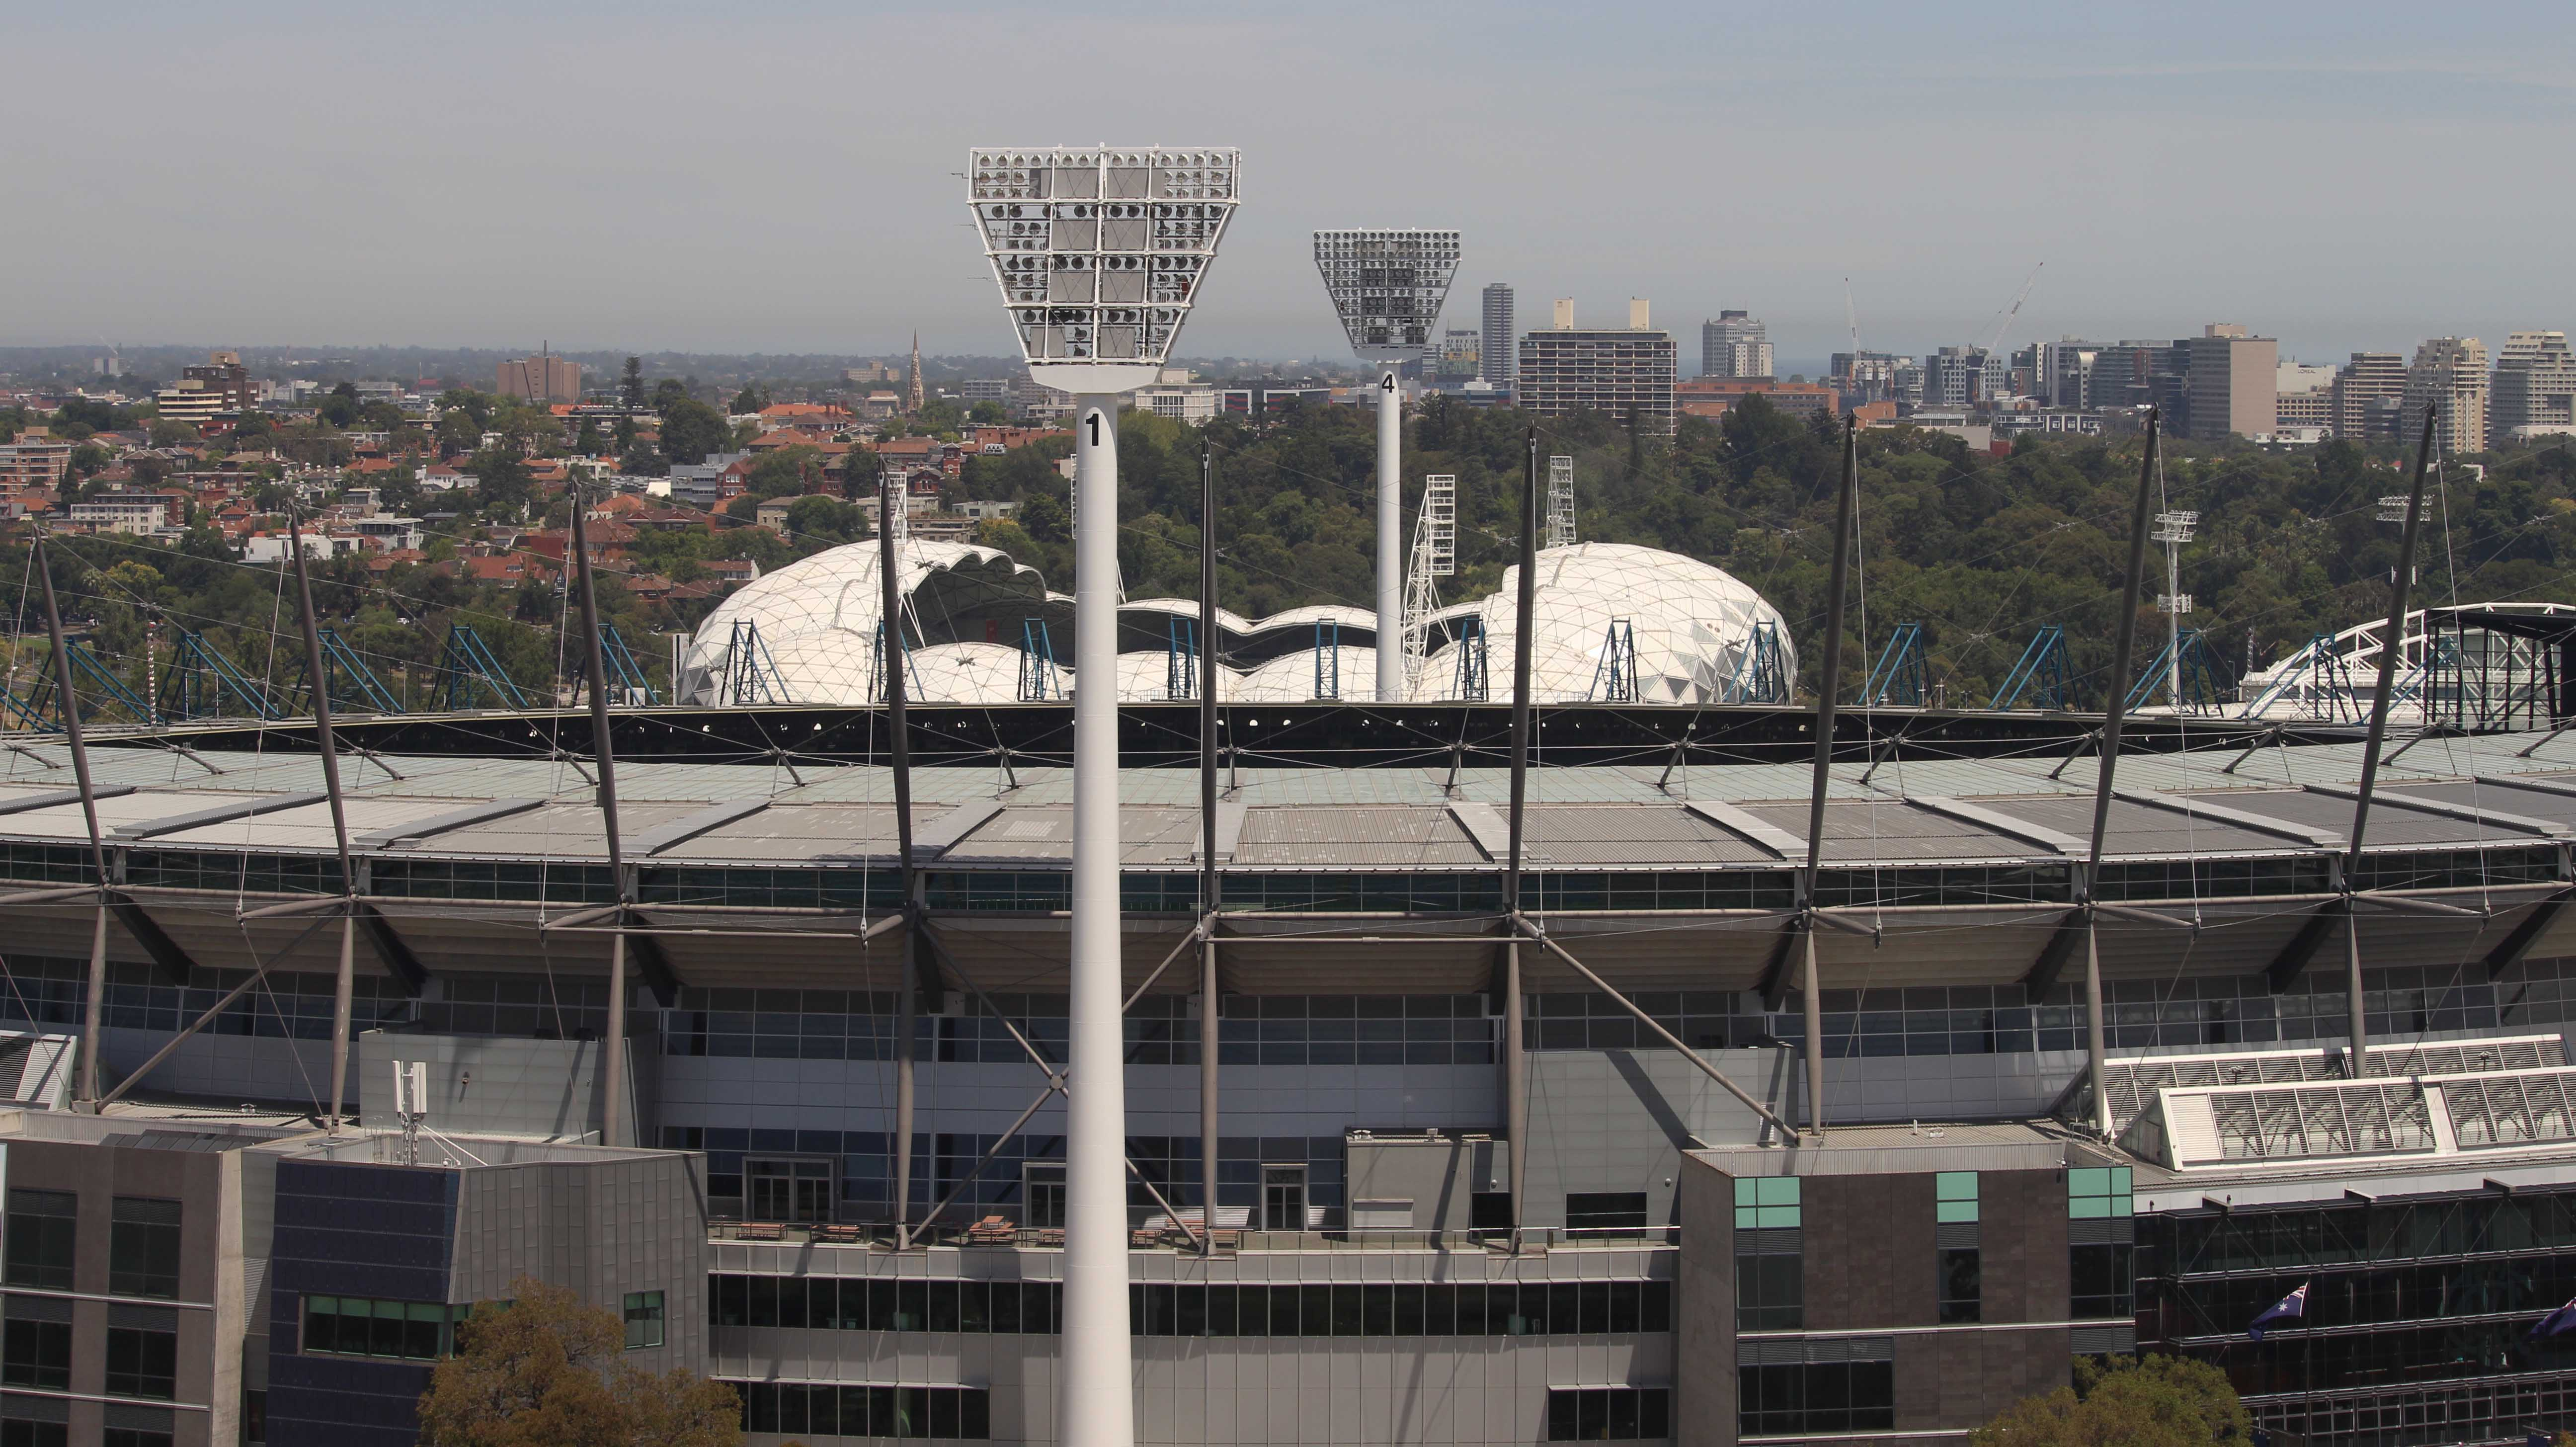 Melbourne - Article 2